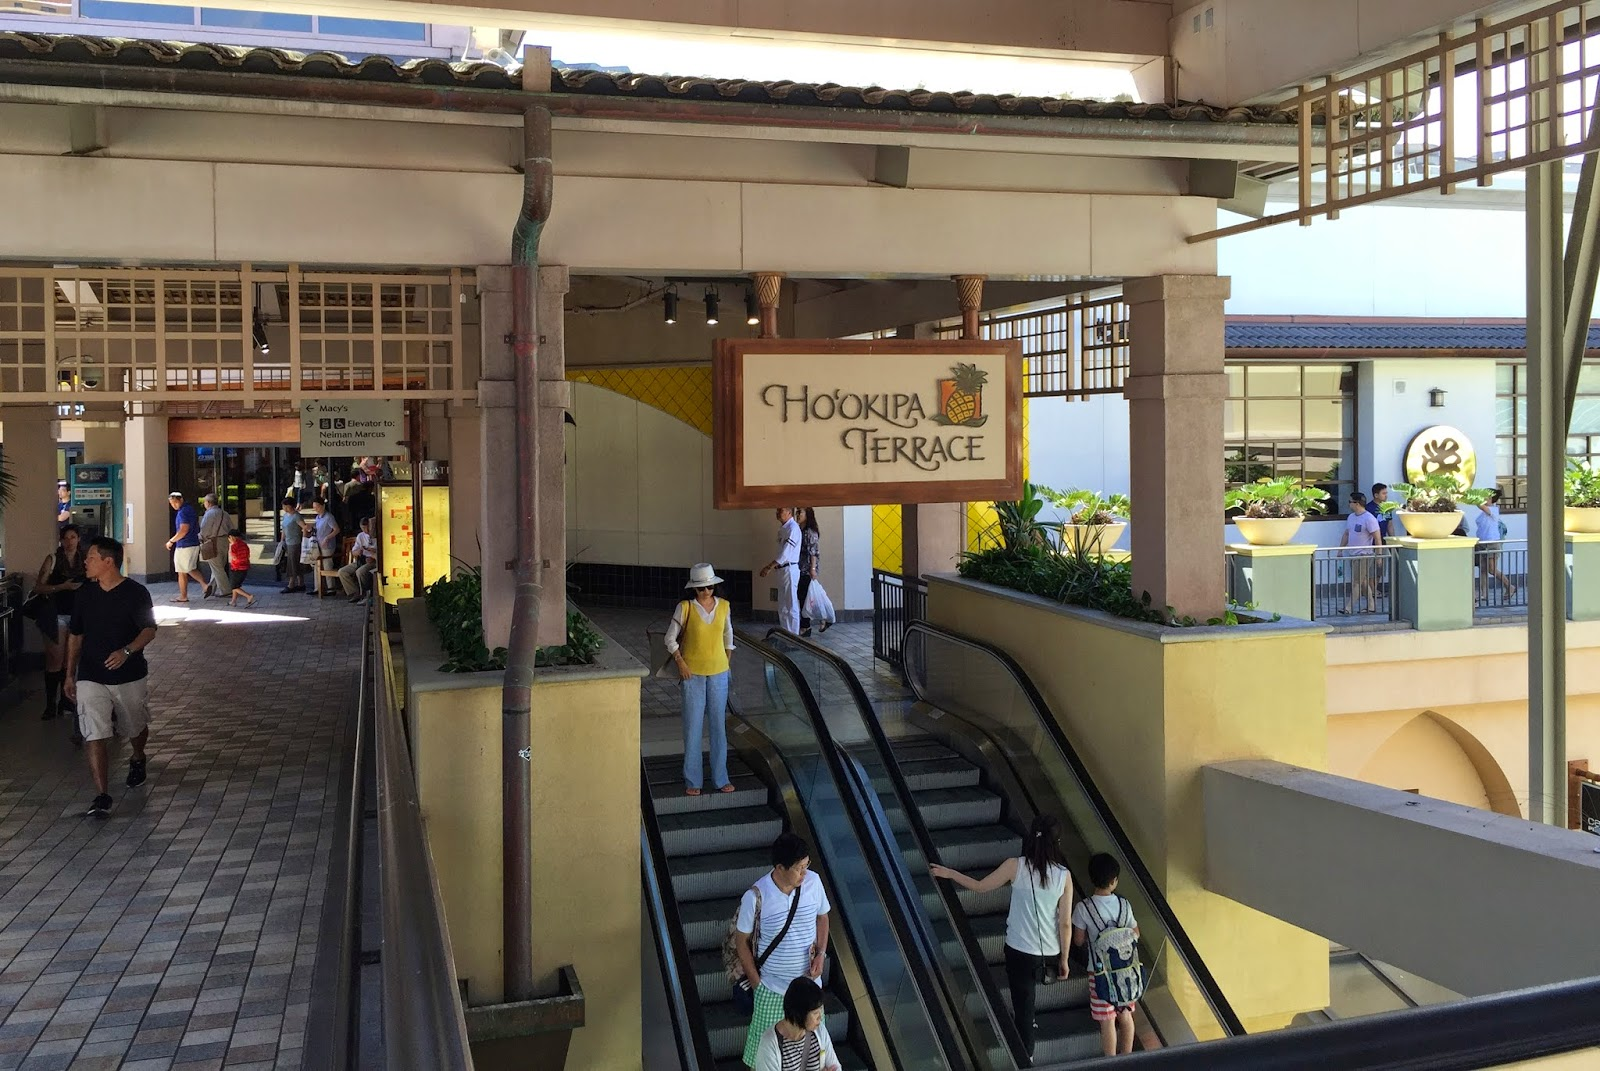 TASTE OF HAWAII: JADE DYNASTY SEAFOOD RESTAURANT